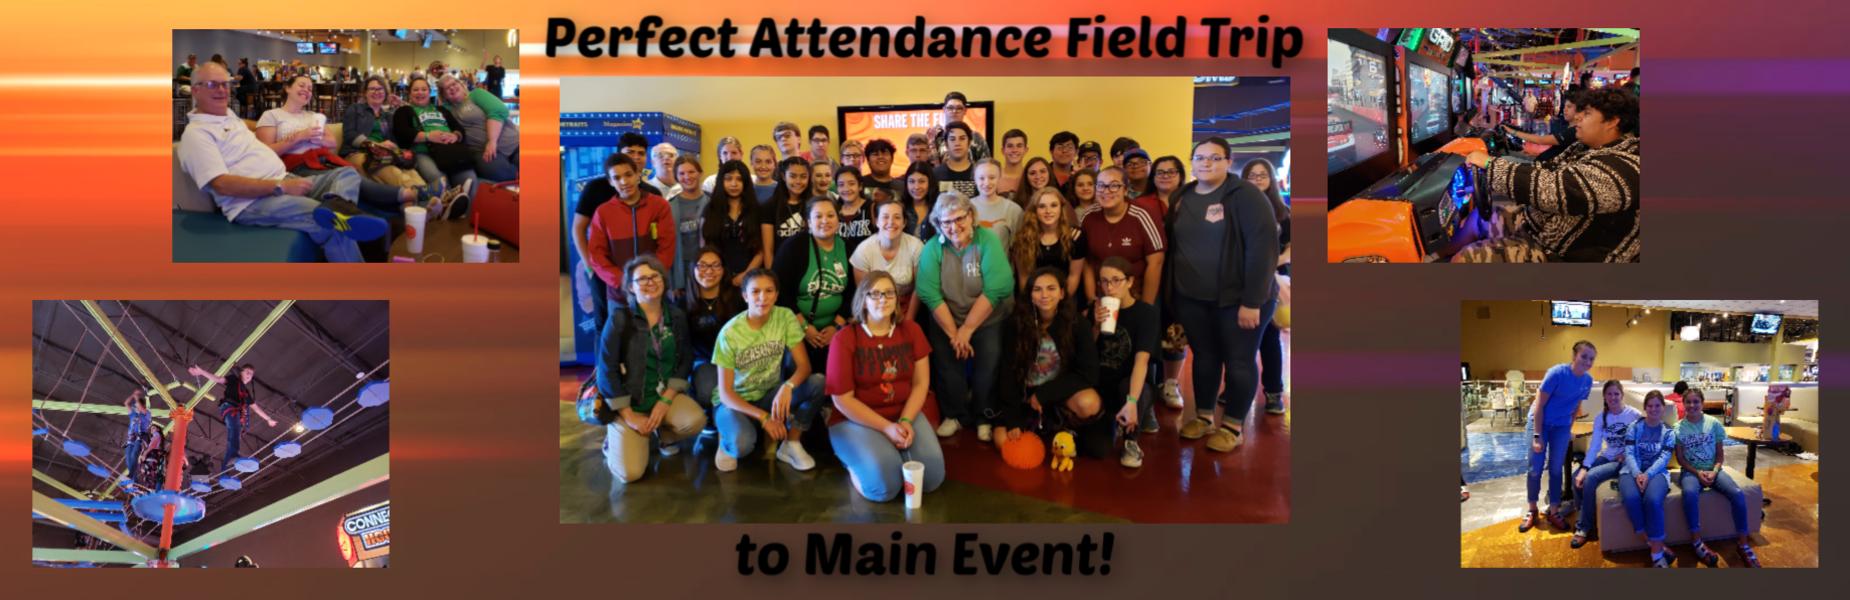 perfect attendance field trip